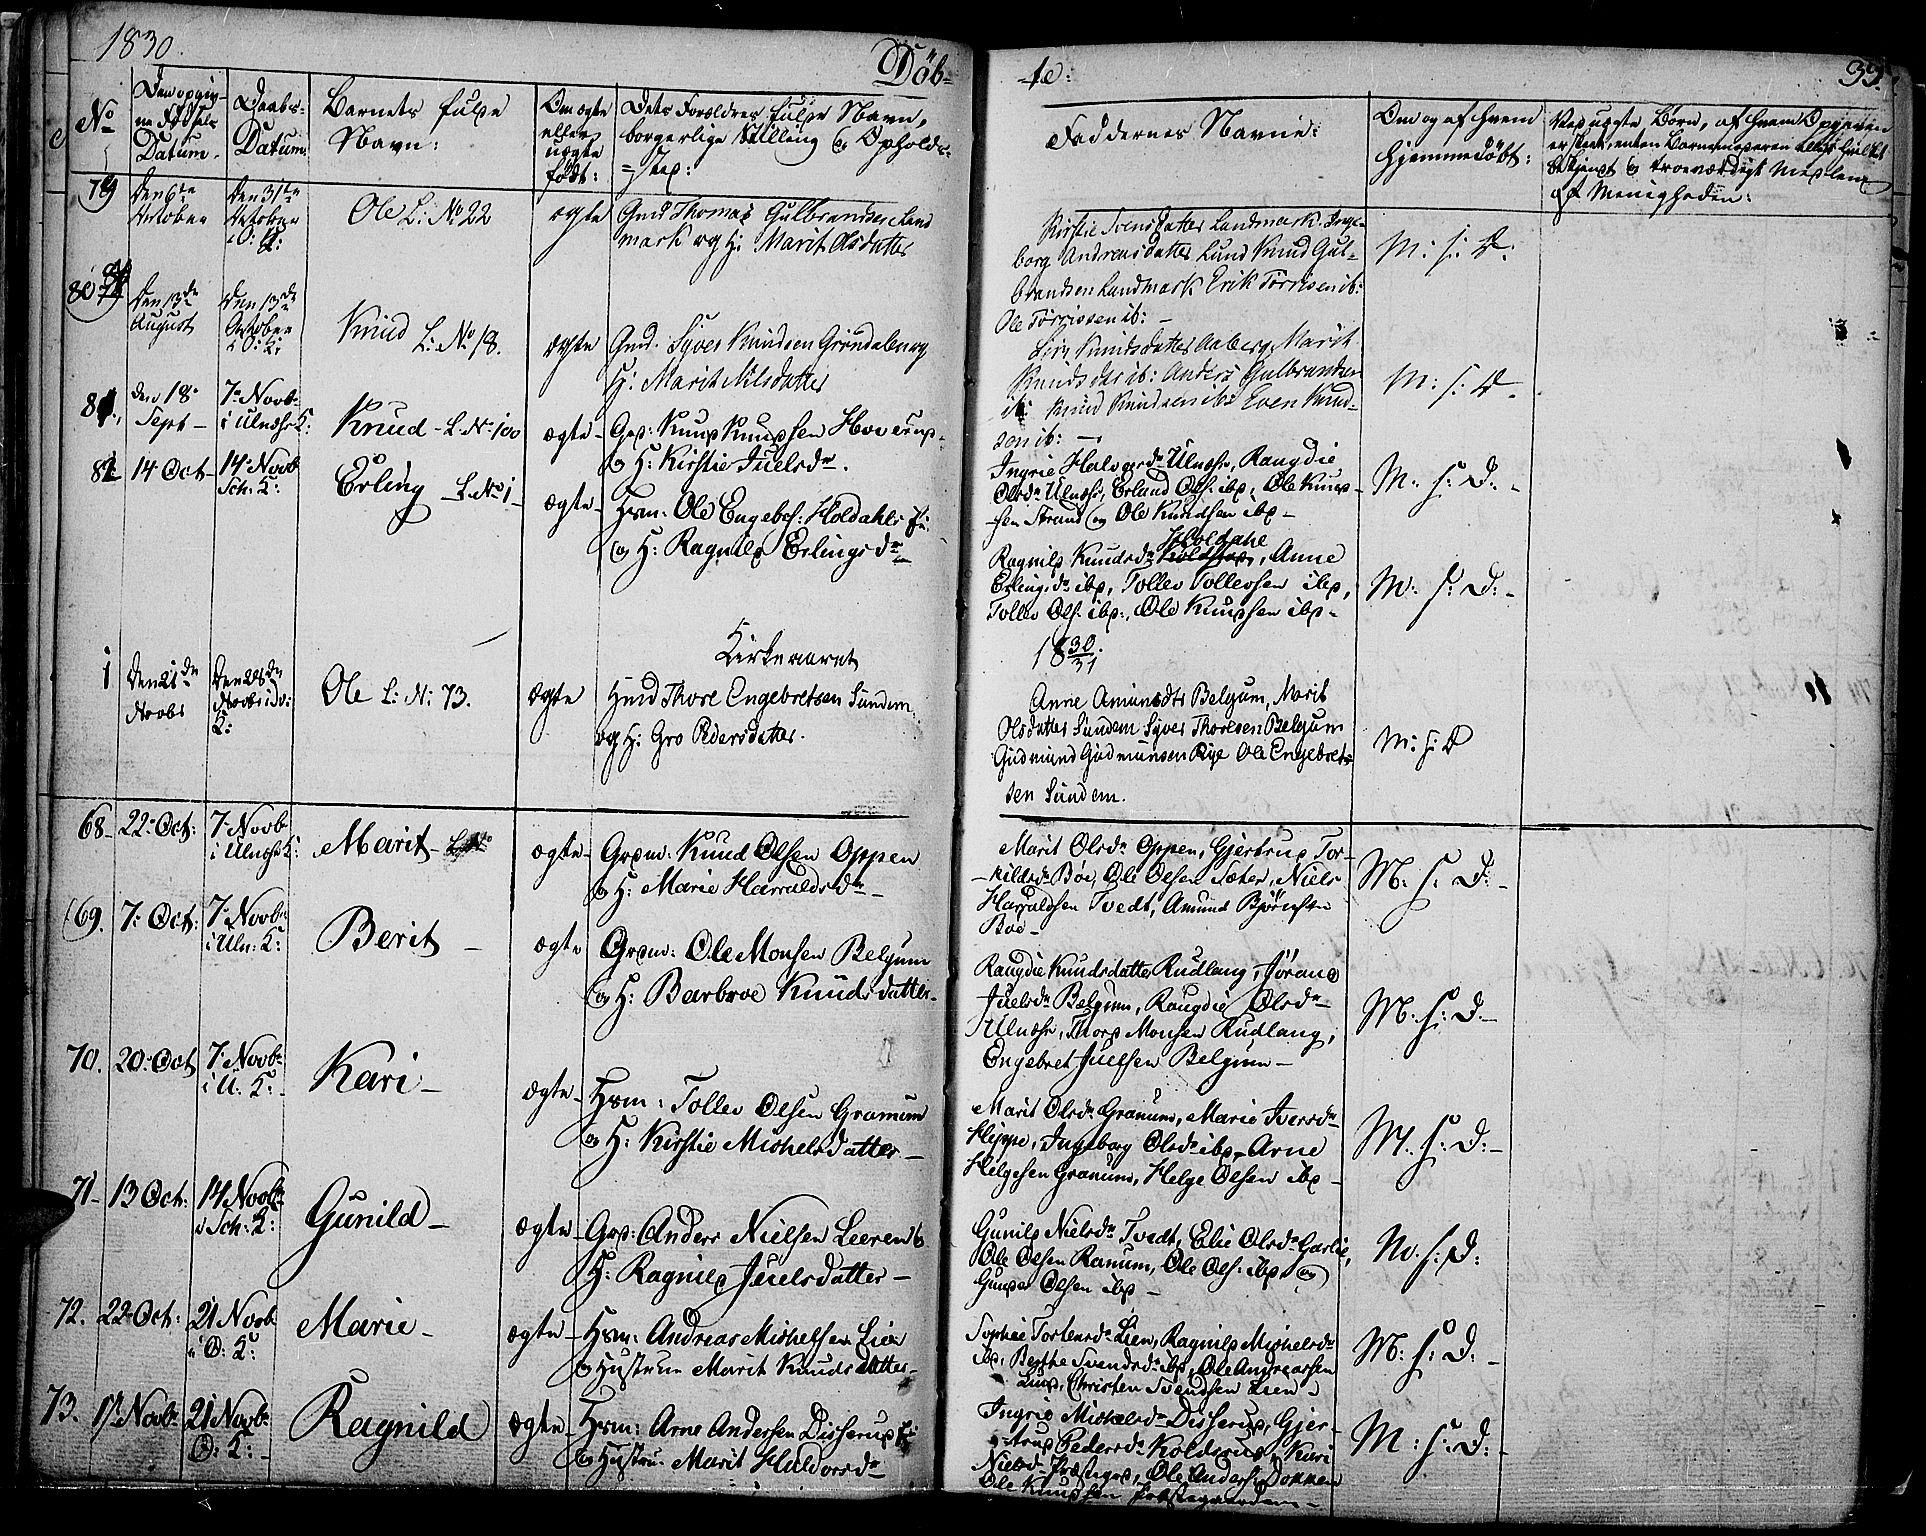 SAH, Nord-Aurdal prestekontor, Ministerialbok nr. 3, 1828-1841, s. 33